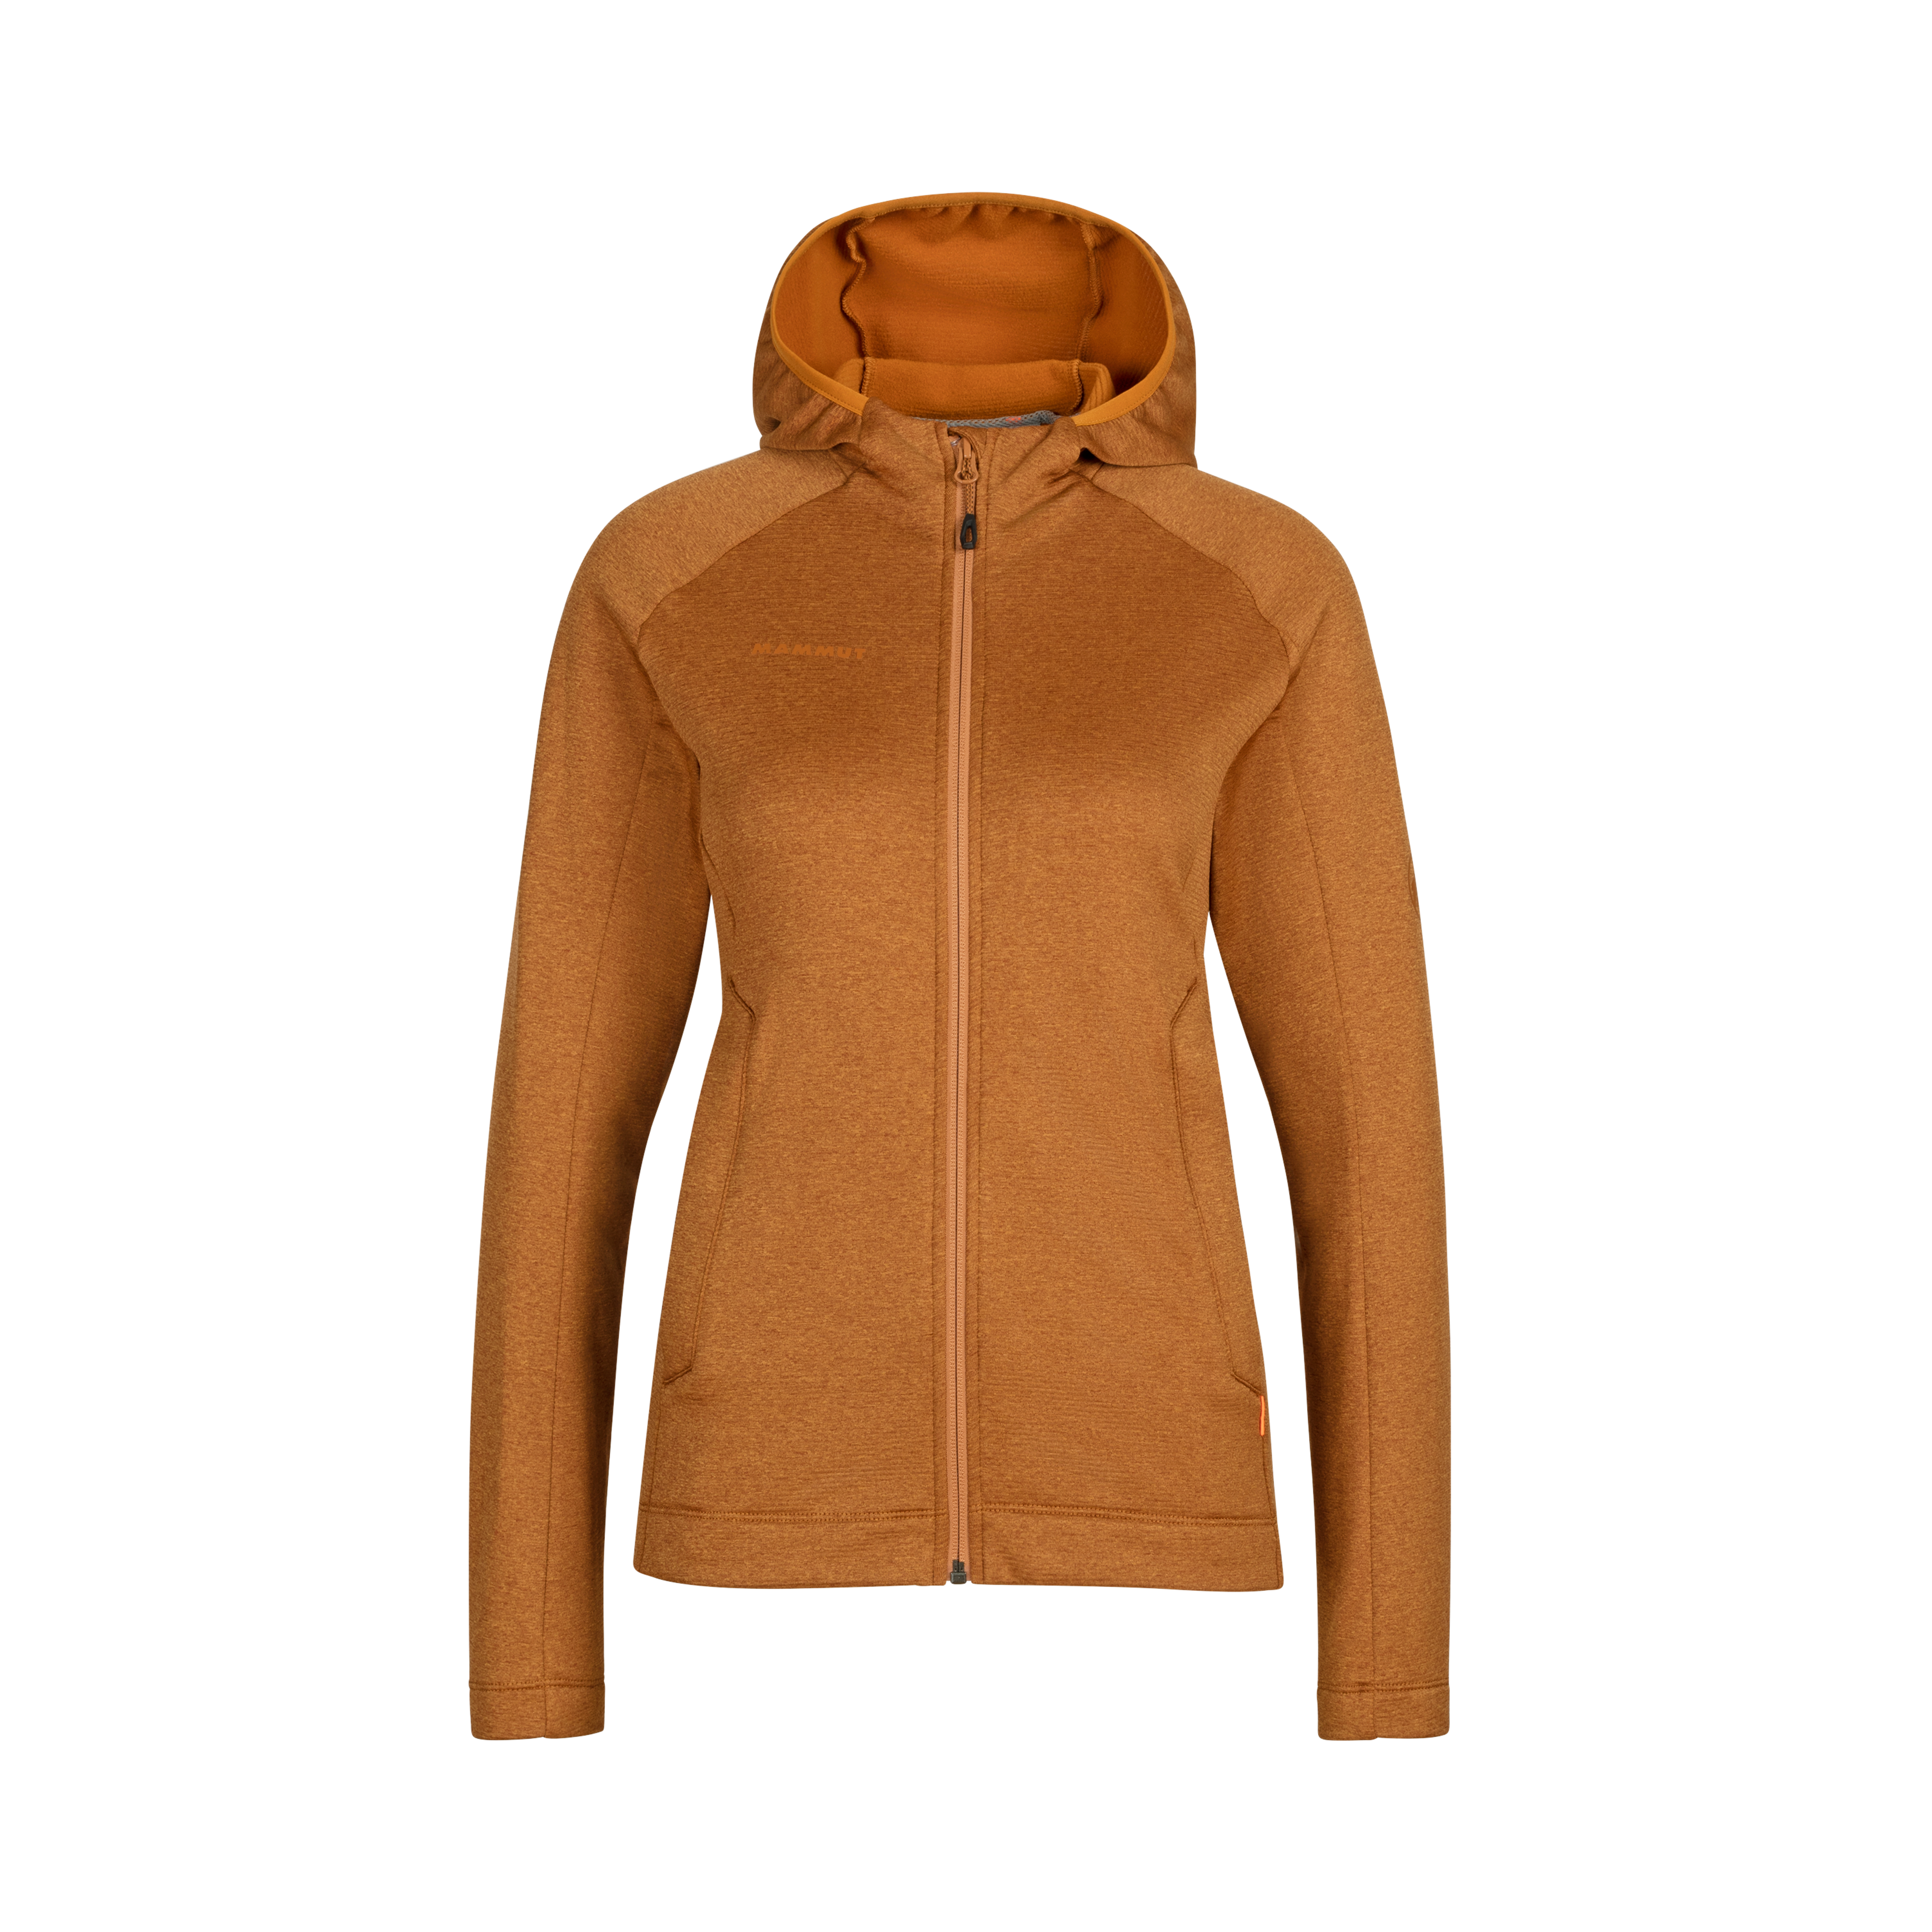 Nair ML Hooded Jacket Women - S, tumeric melange thumbnail